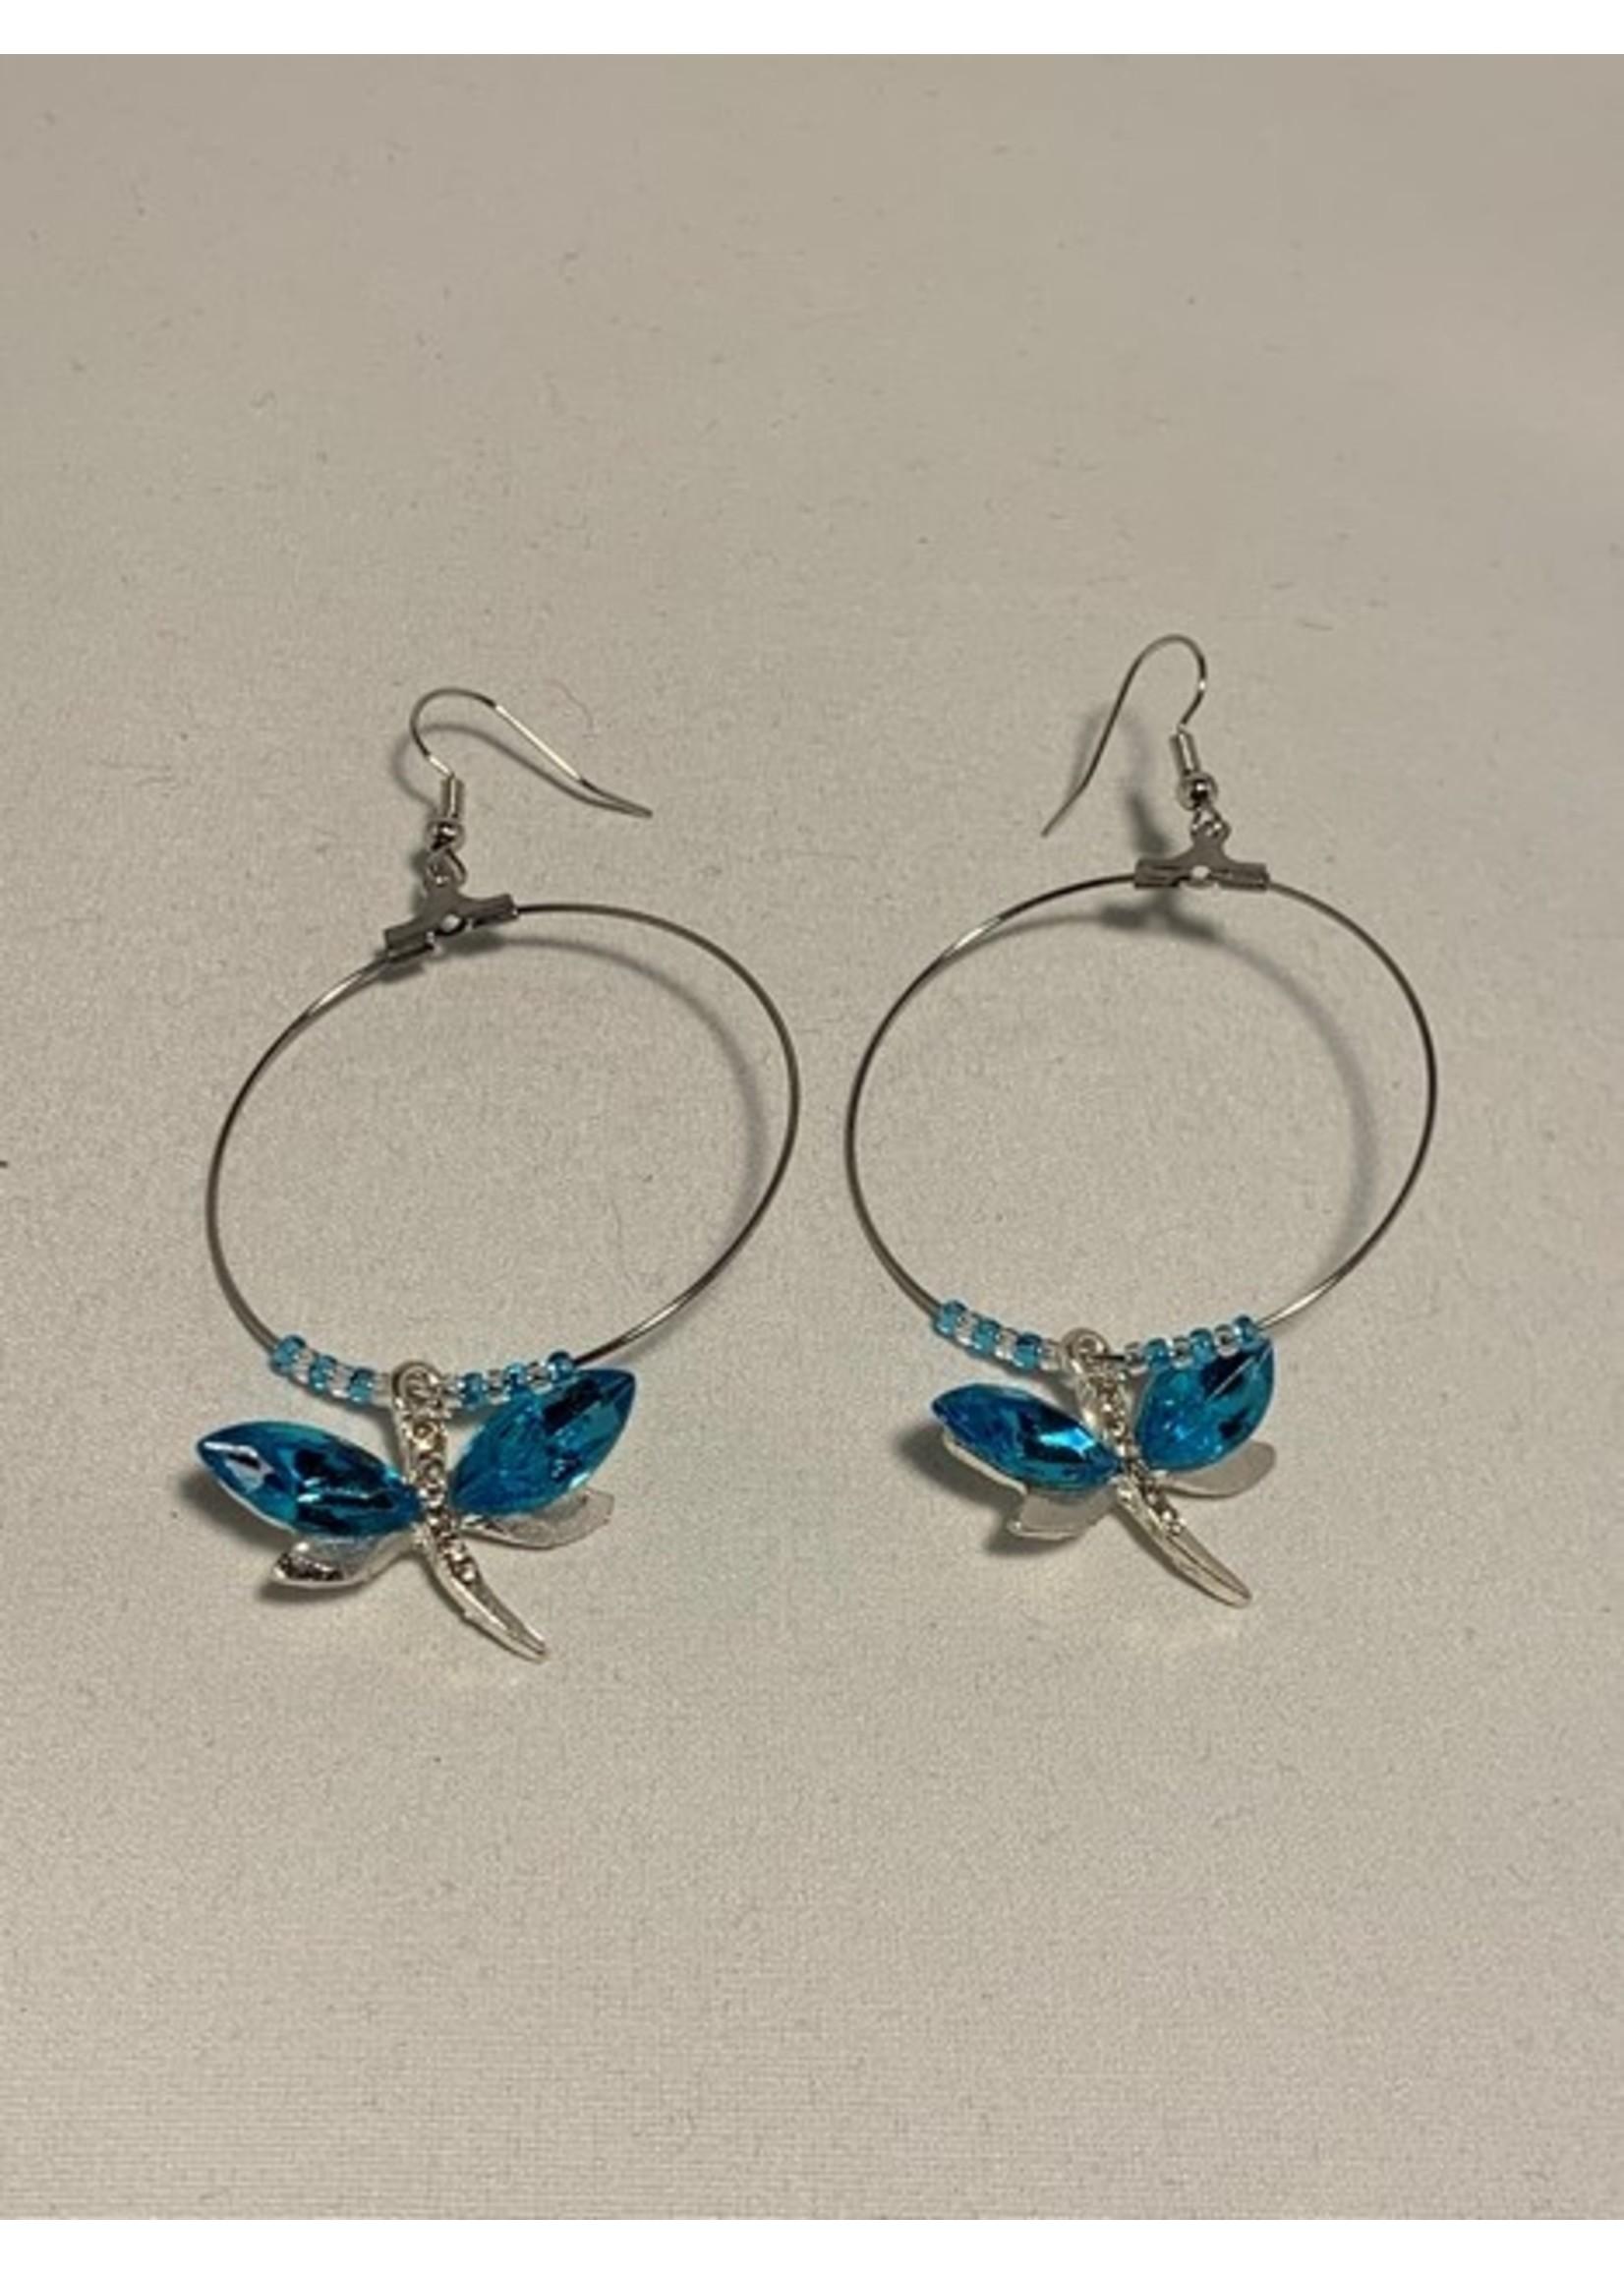 Large Hoop Earrings Light Blue Dragonfly